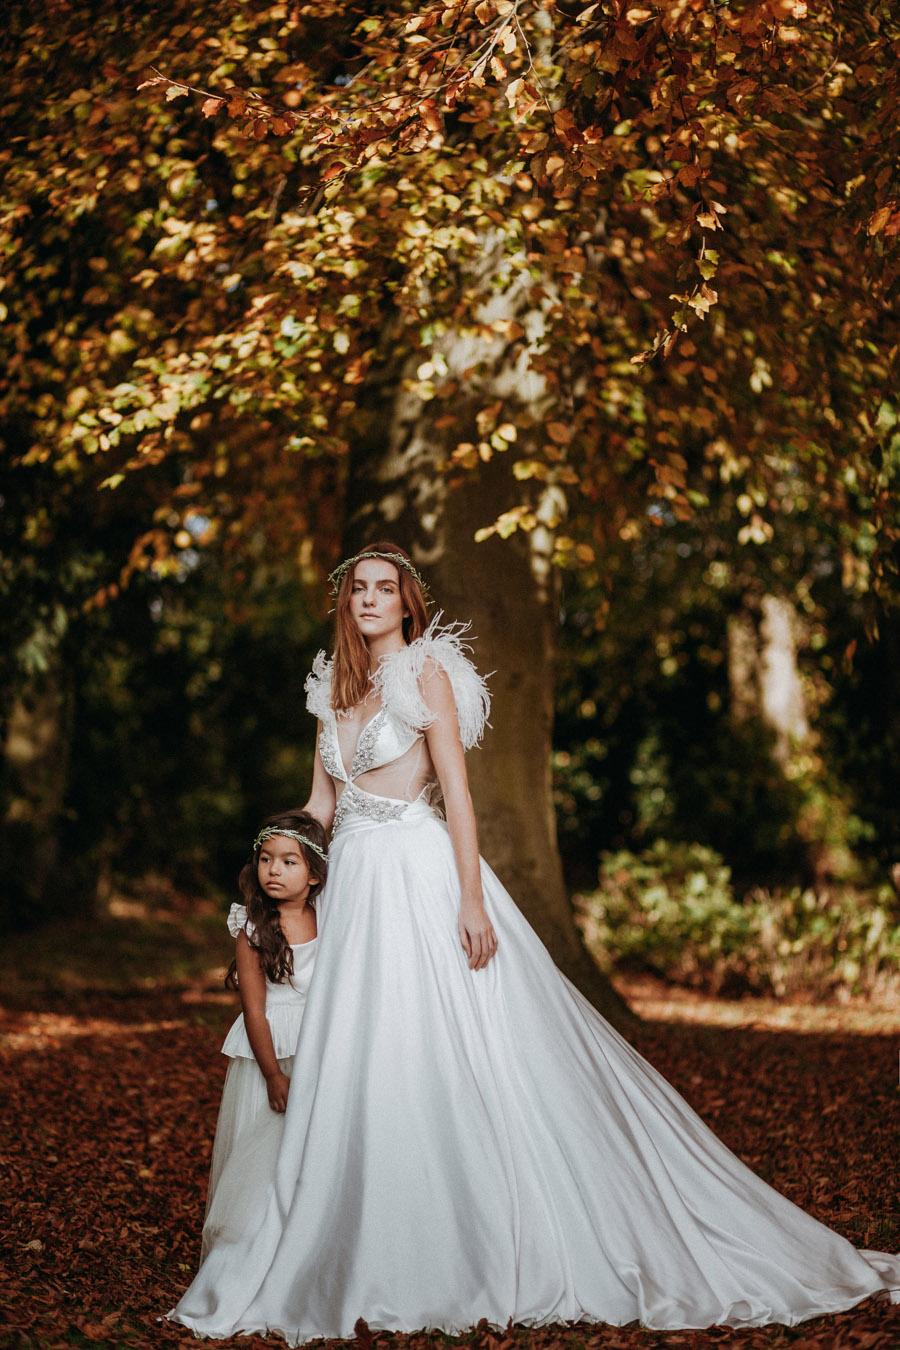 Sanyukta Shrestha autumn daydream bridal collection 2020 (27)